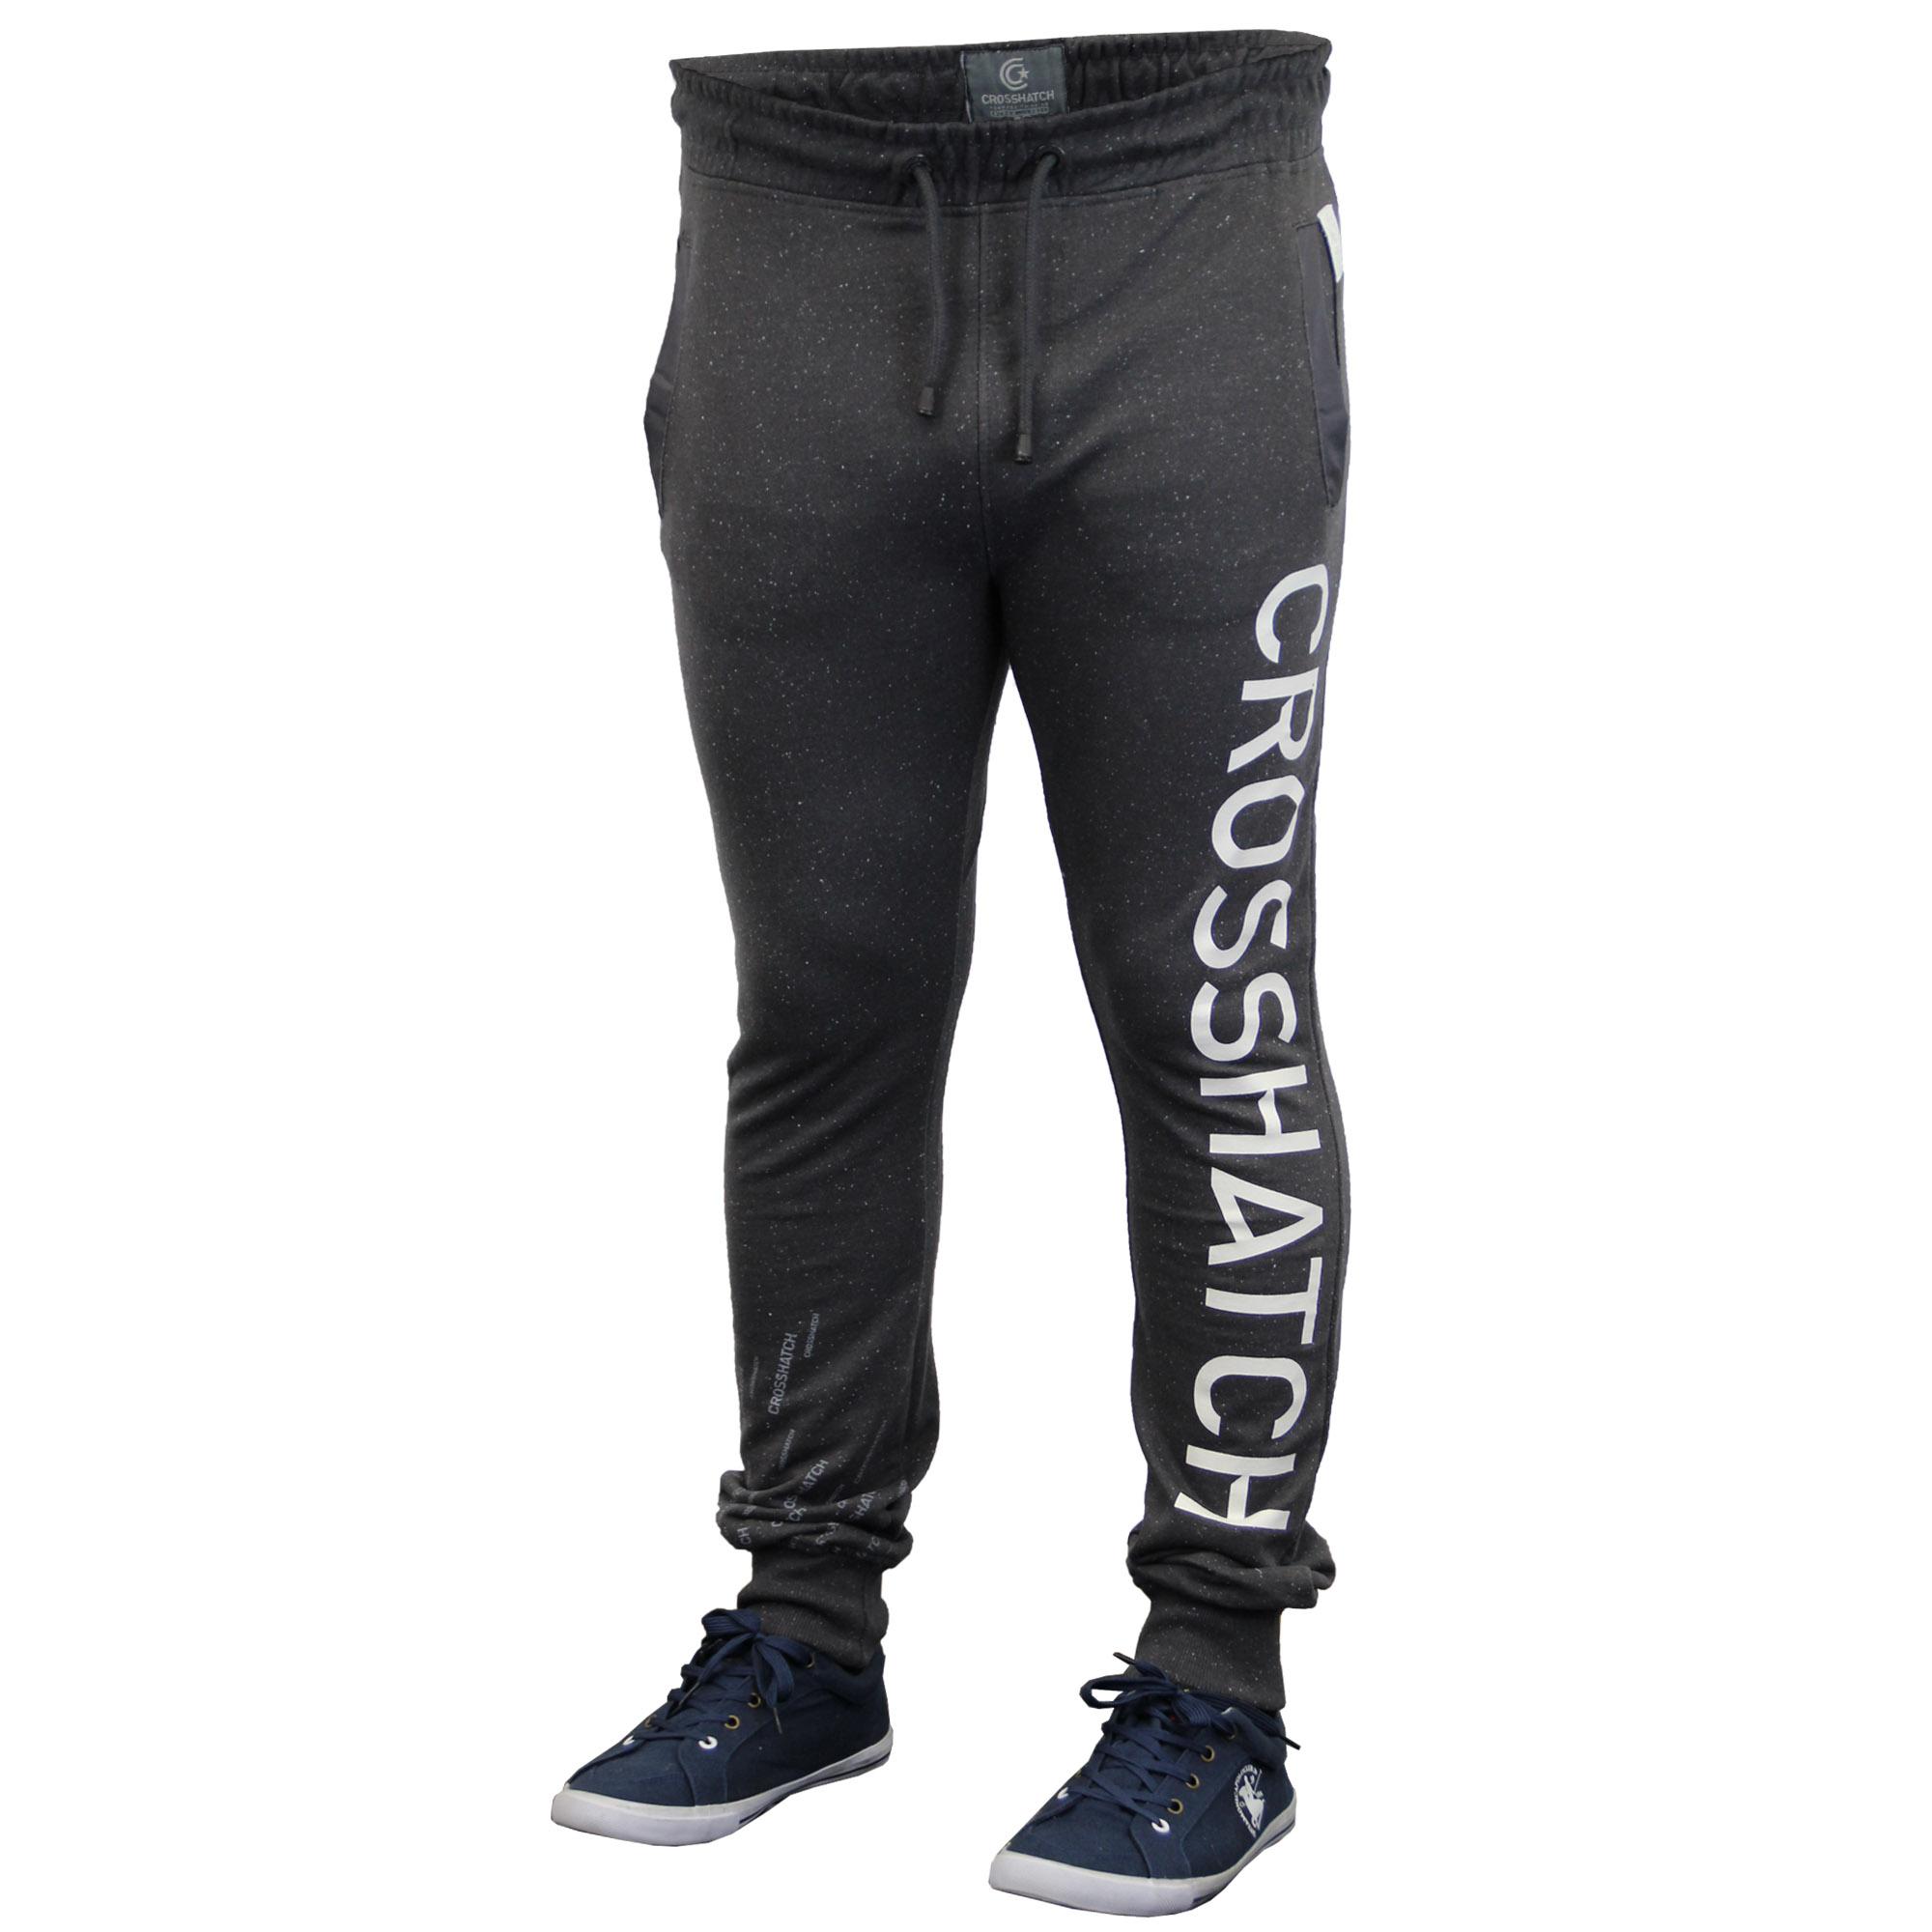 aae750d5e01f Mens Bottoms Crosshatch Jogging Pants Trousers Marl Cuffed Running ...